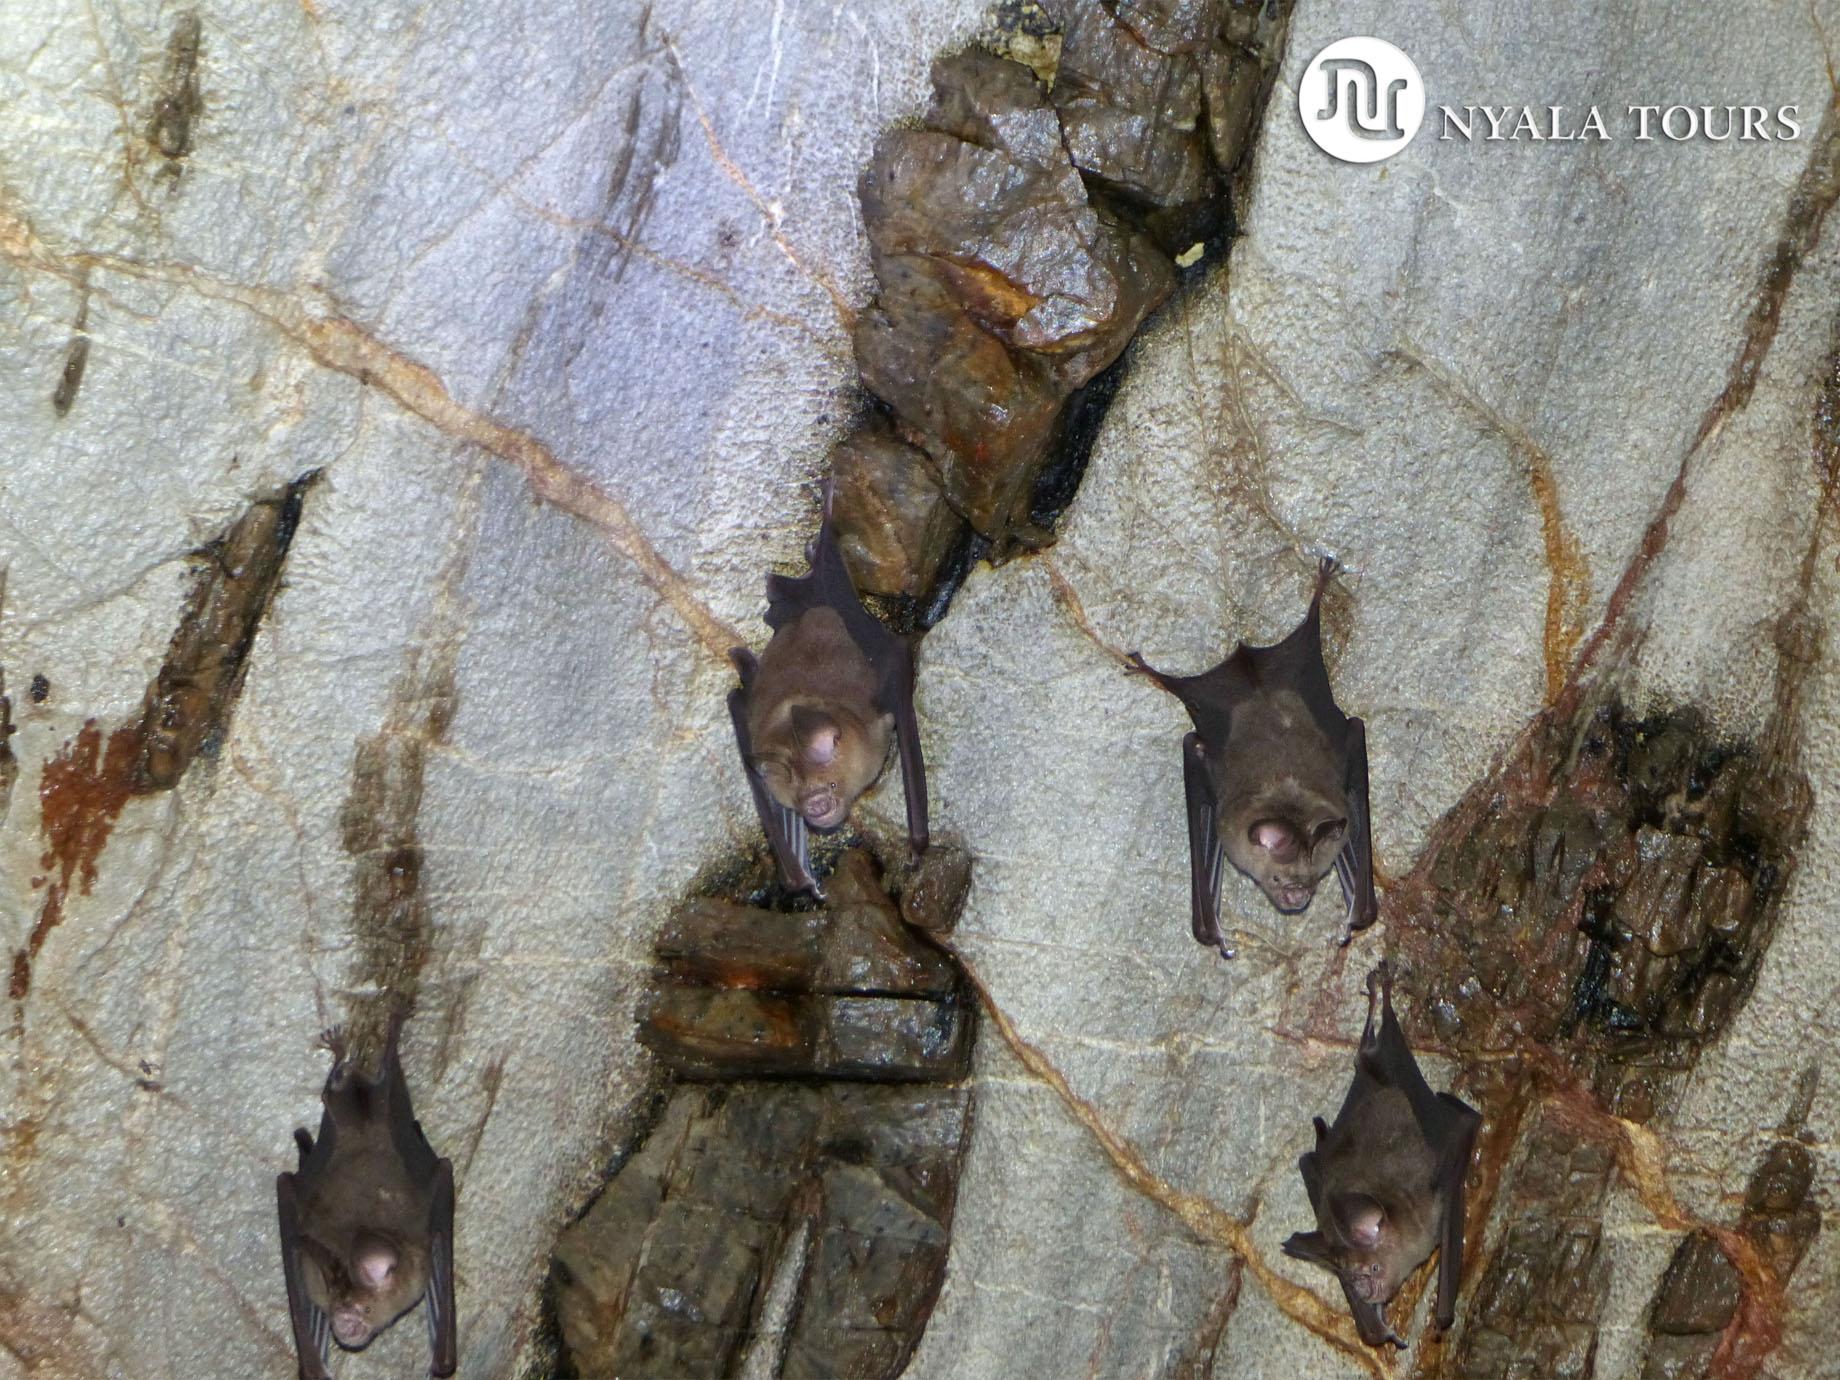 wrinkly bat small